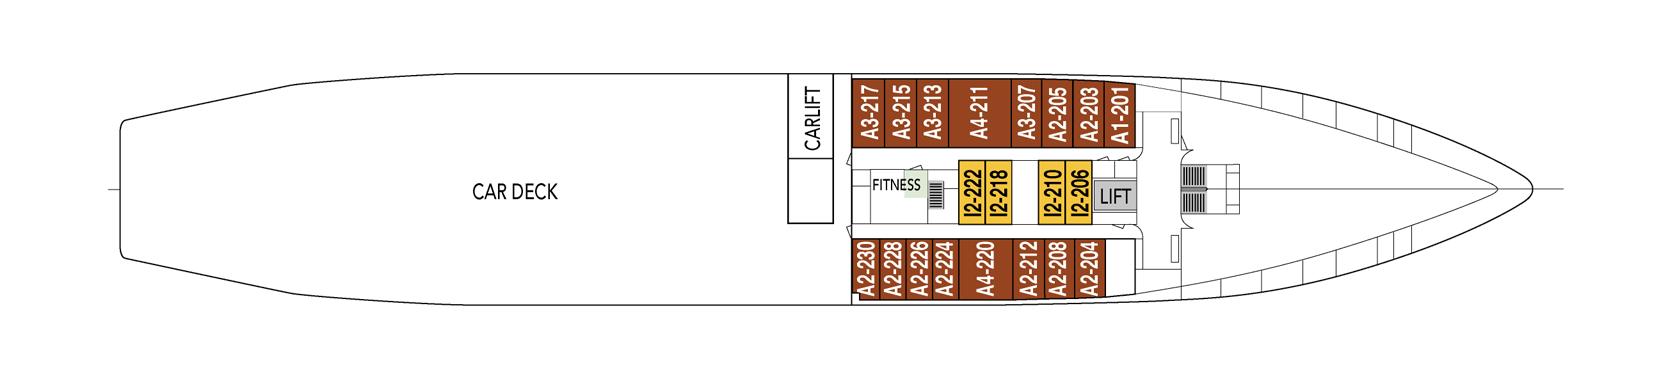 Hurtigruten MS Vesteralen Deck Plans Deck B.png